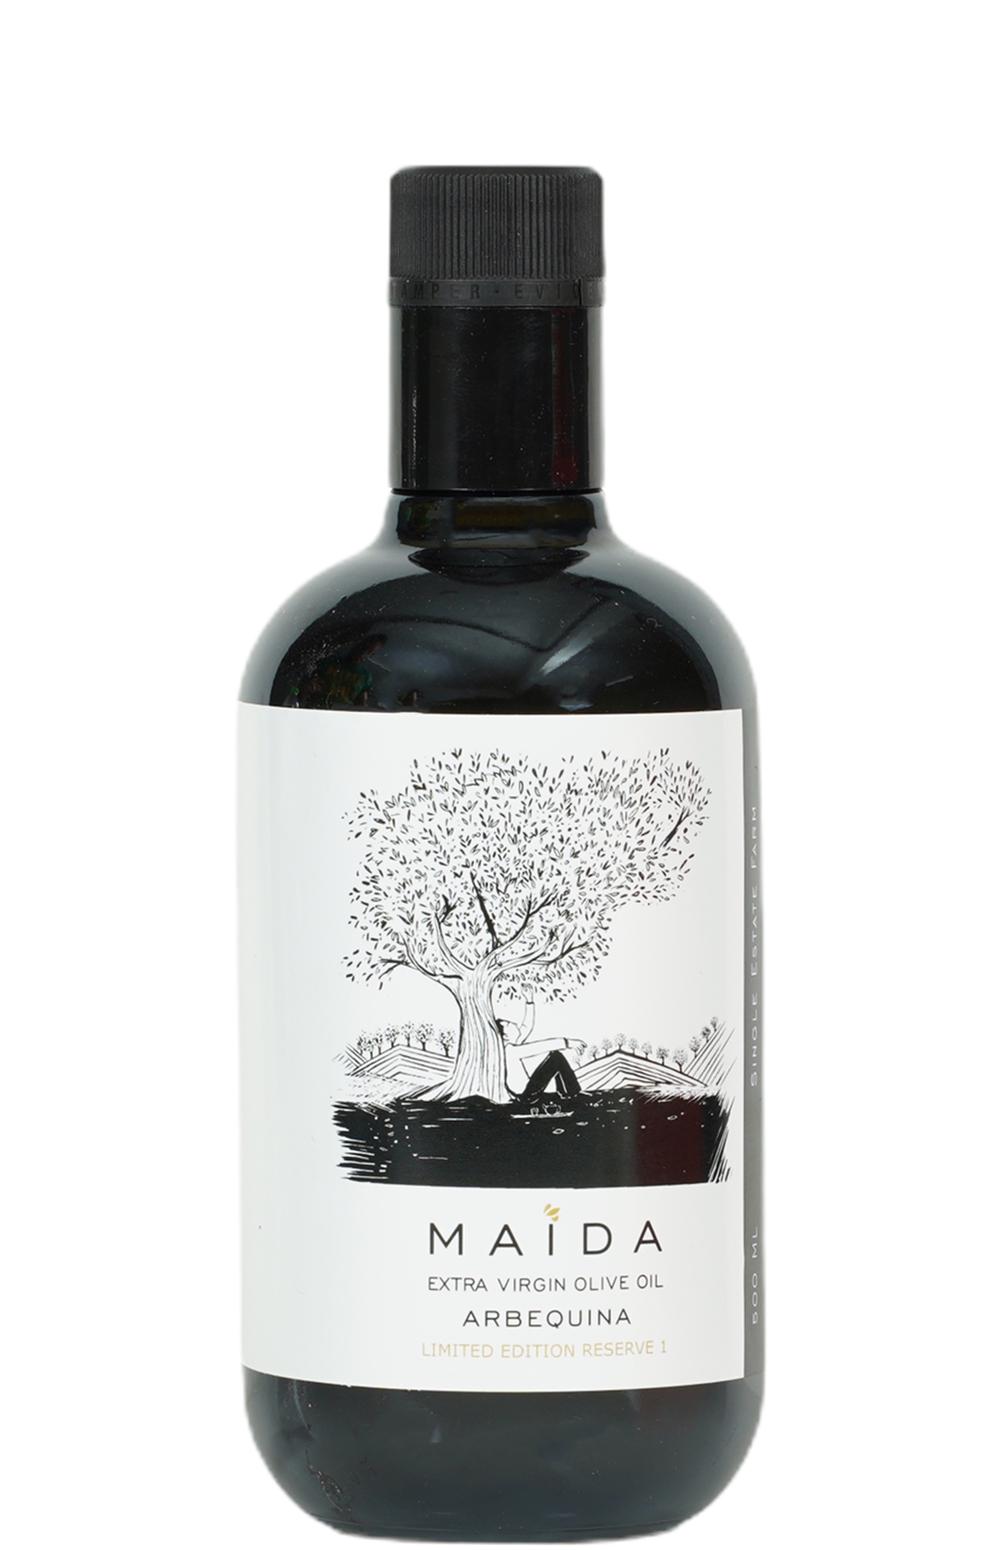 Maida Limited Edition Reserve I